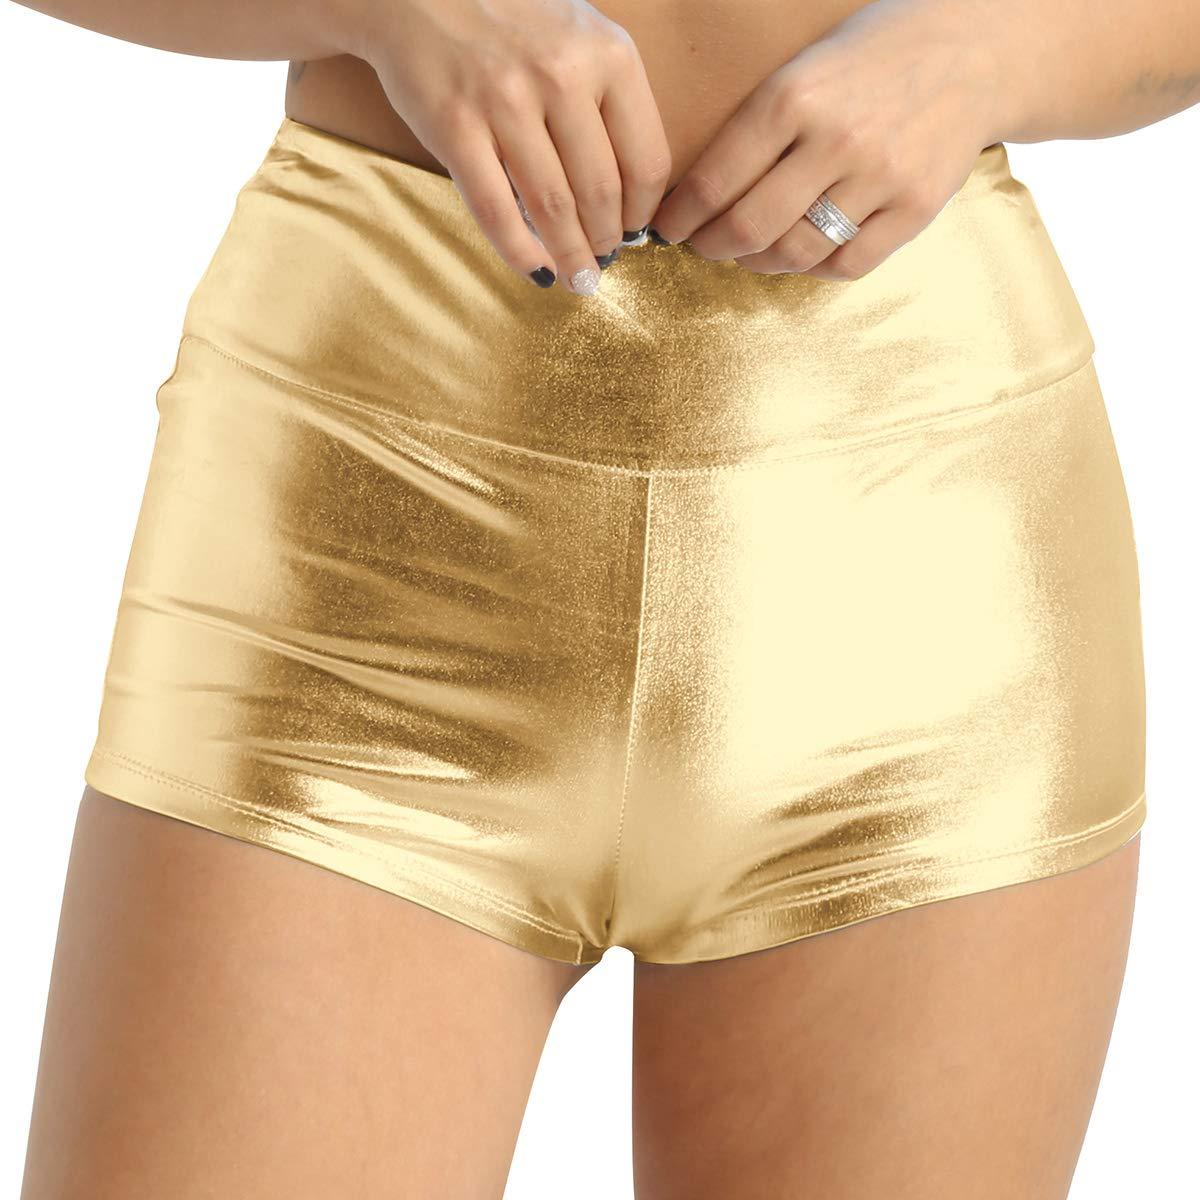 Agoky Damen Shorts Metallic Hot Pants Leder-Optik hoch taillierte Bikini Minishorts Sport Fitness Tanz Badehose Glänzend Booty Panty